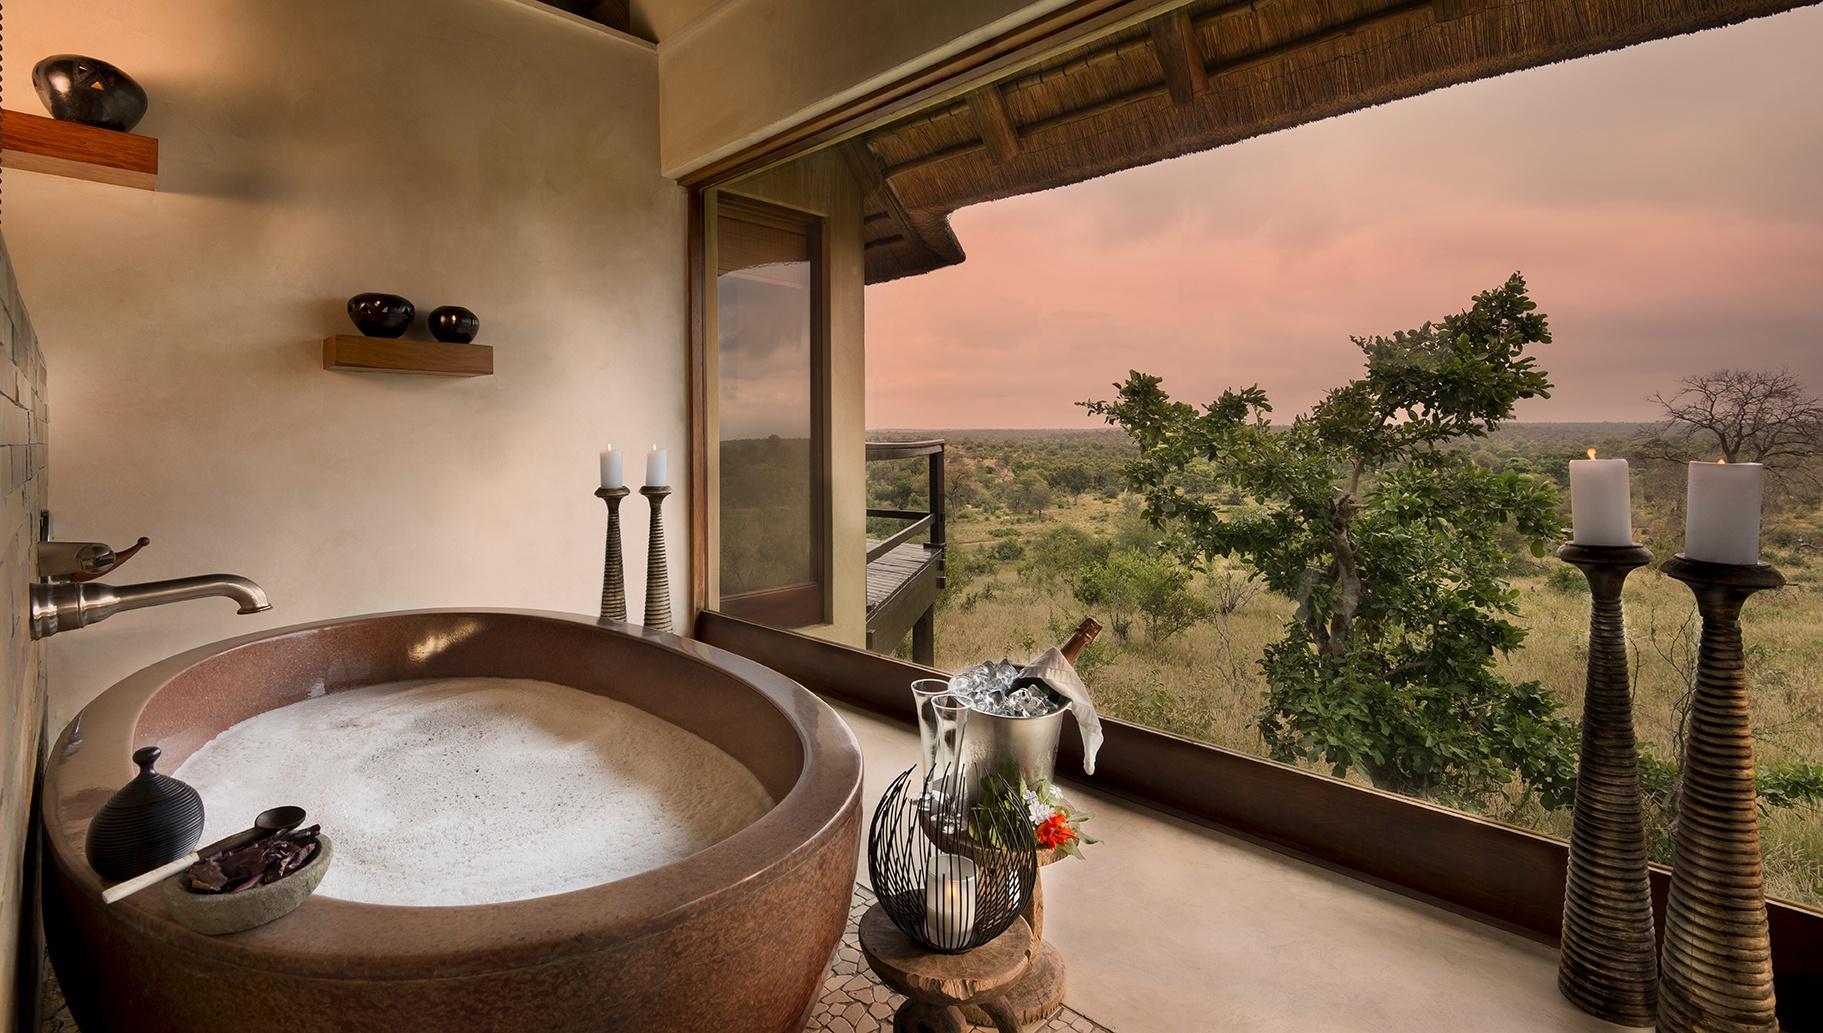 bathroom-view-nature-restful